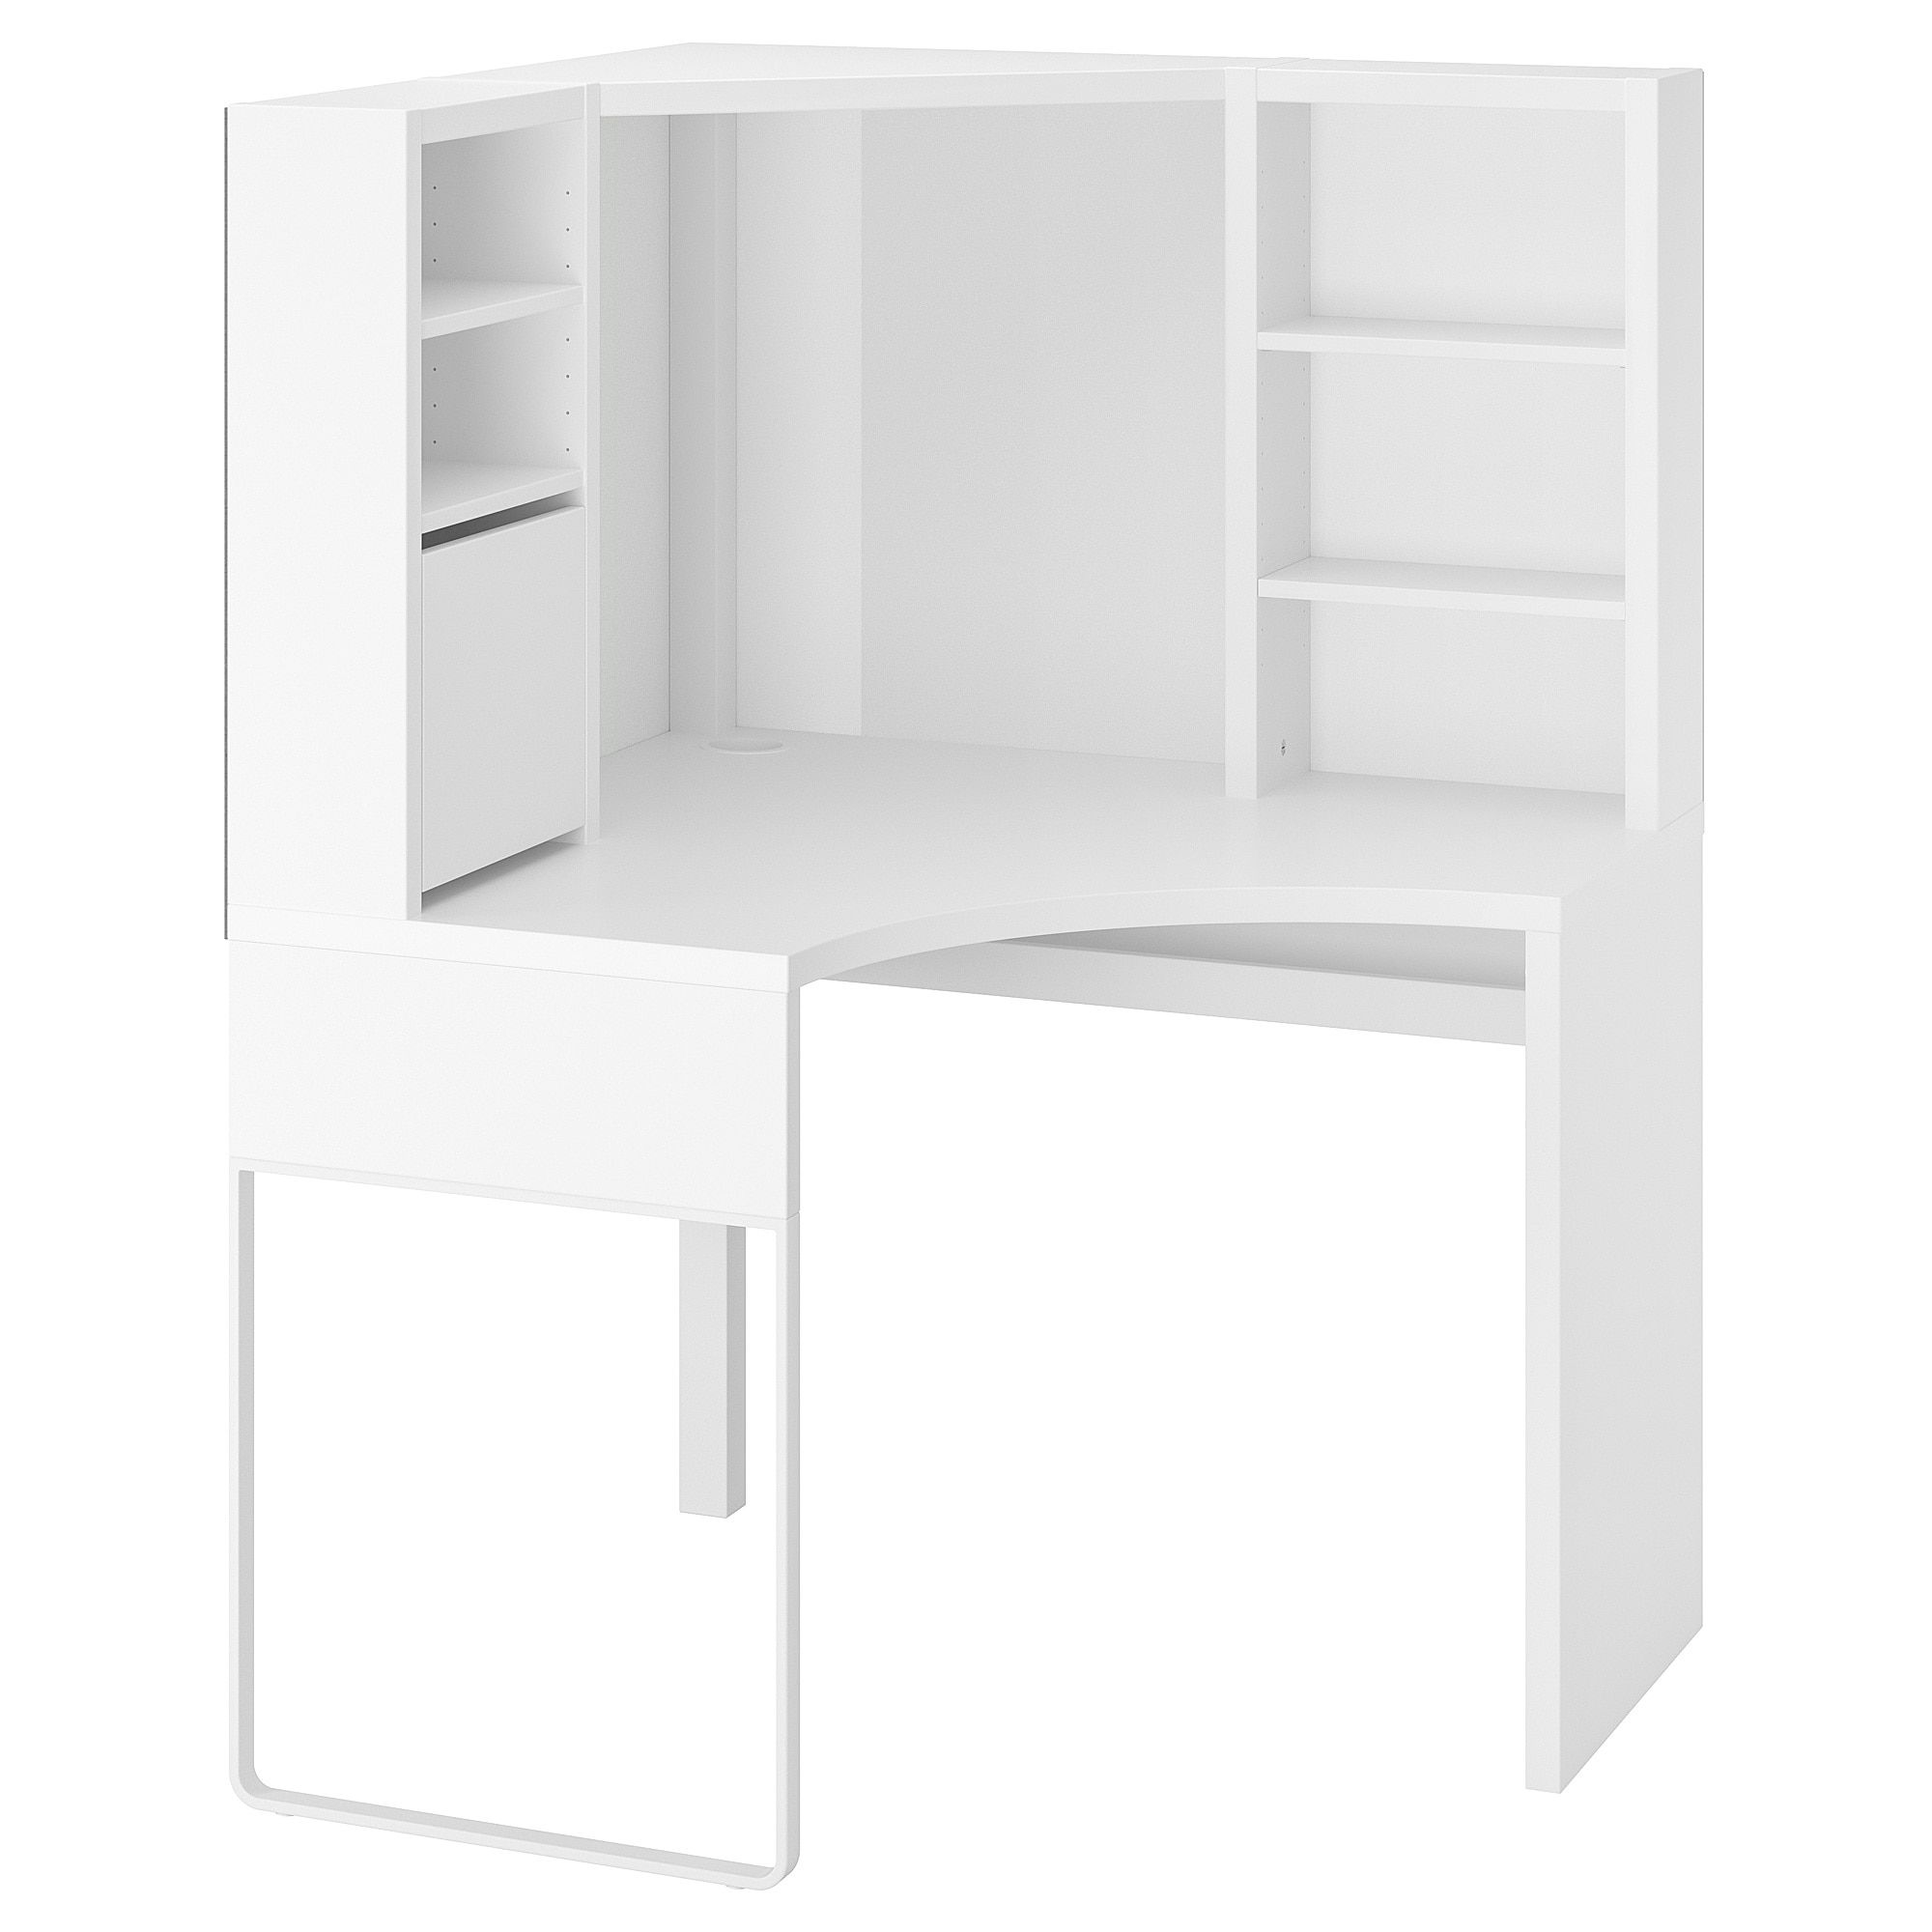 Micke Corner Workstation Black Brown 39 3 8x55 7 8 Ikea Corner Workstation White Corner Desk Home Office Furniture